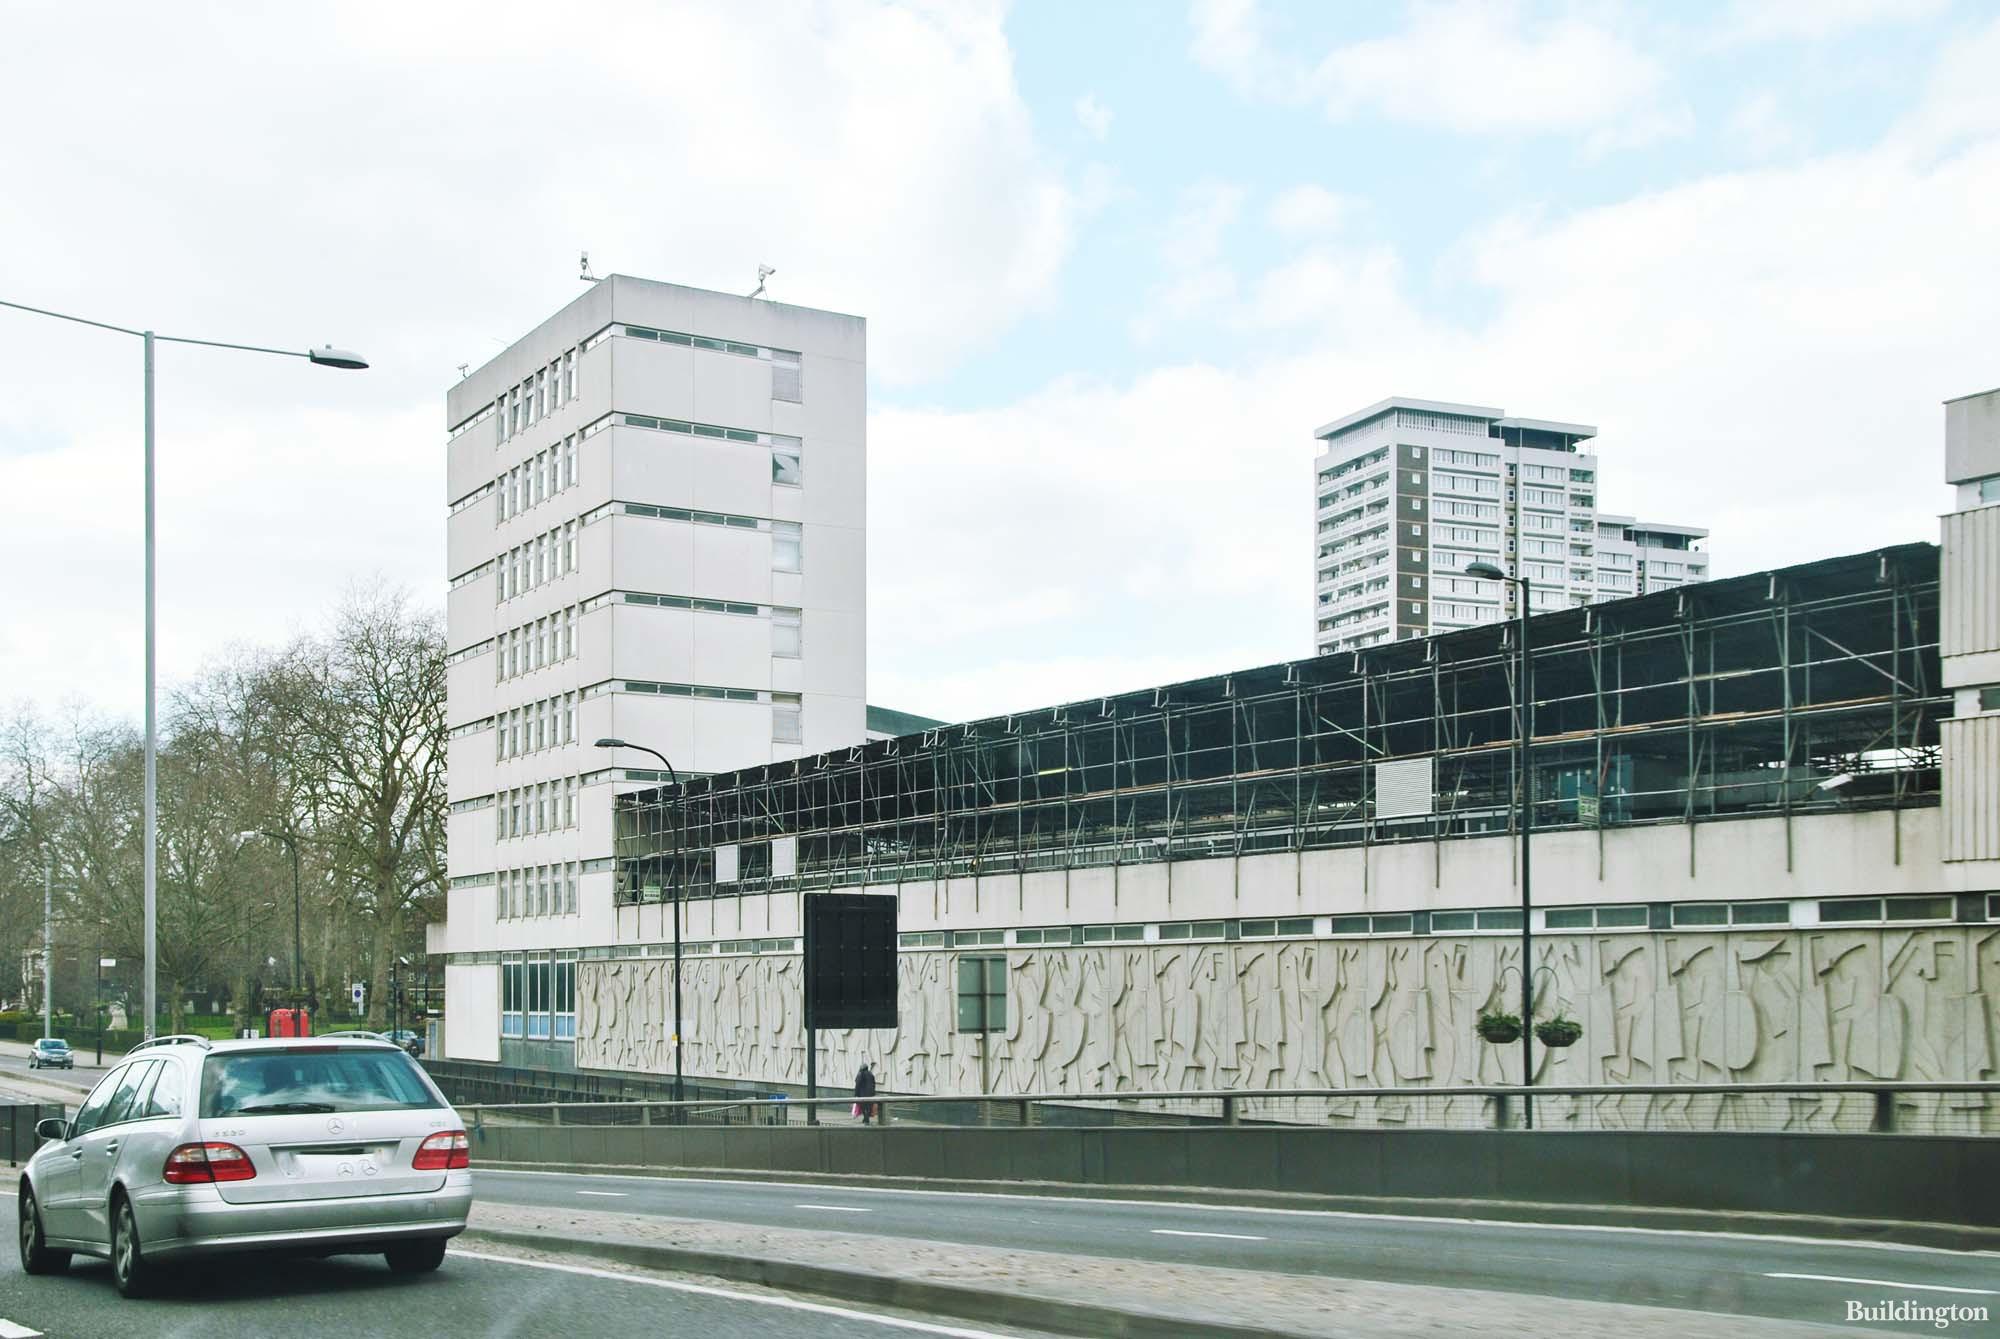 Paddington Green Police Station on Harrow Road in 2013.